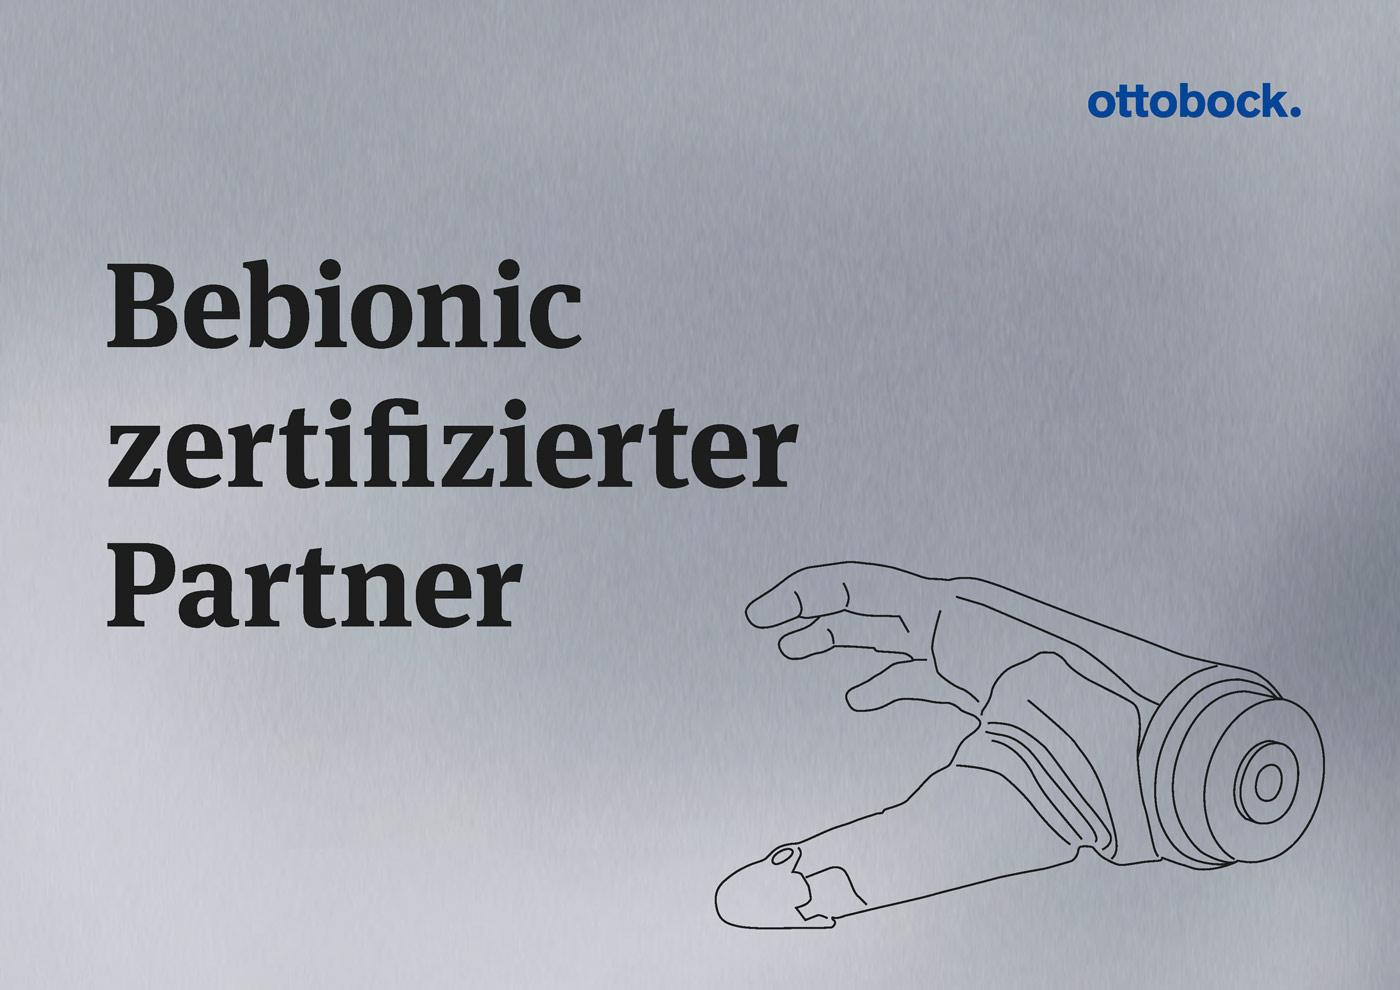 Zertifikat Ottobock Bebionic